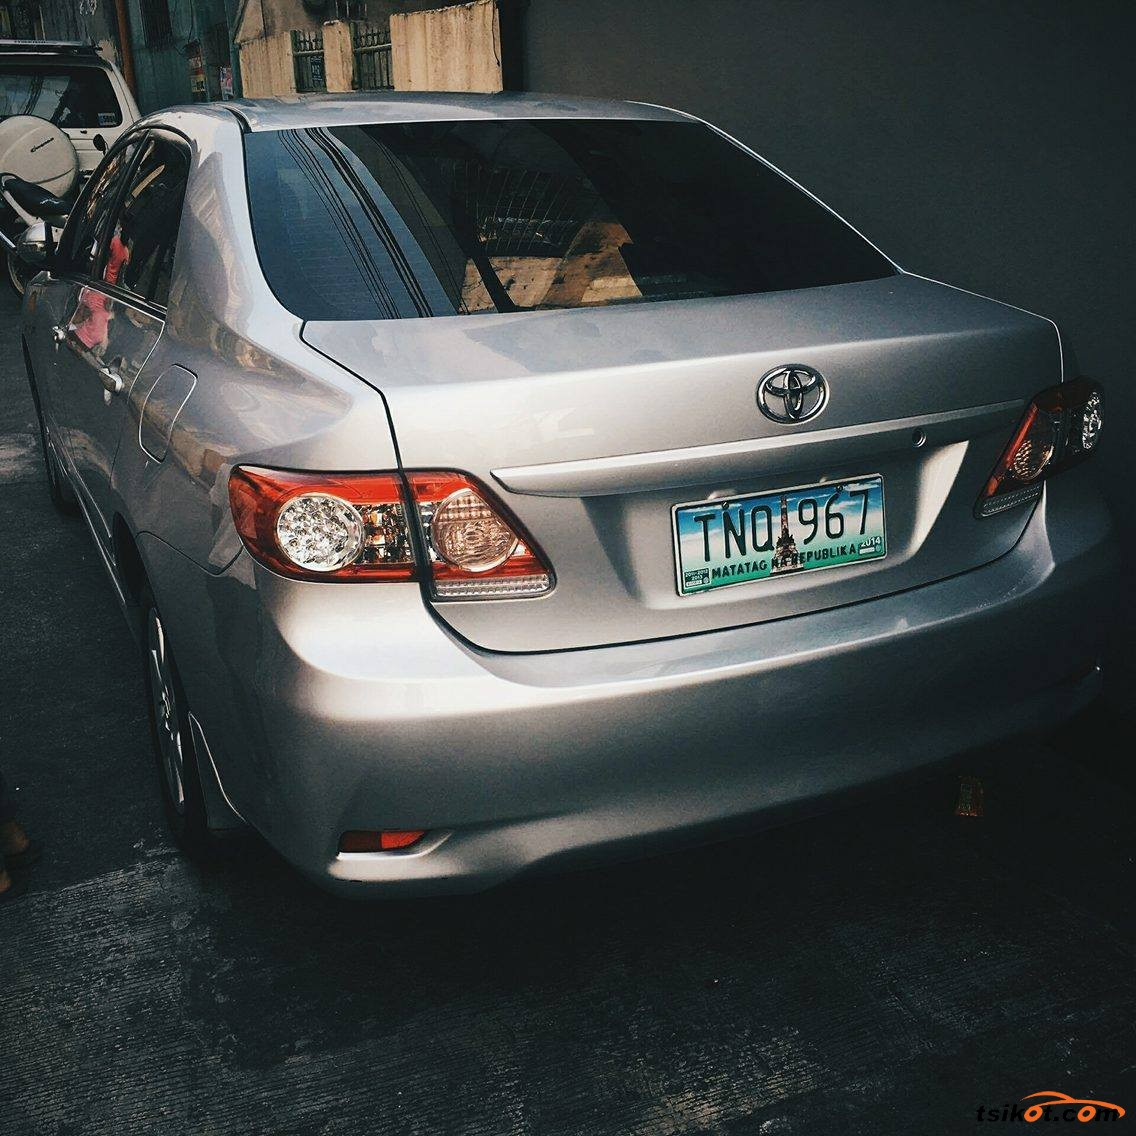 E Car For Sale Philippines >> Toyota Corolla 2011 - Car for Sale Metro Manila